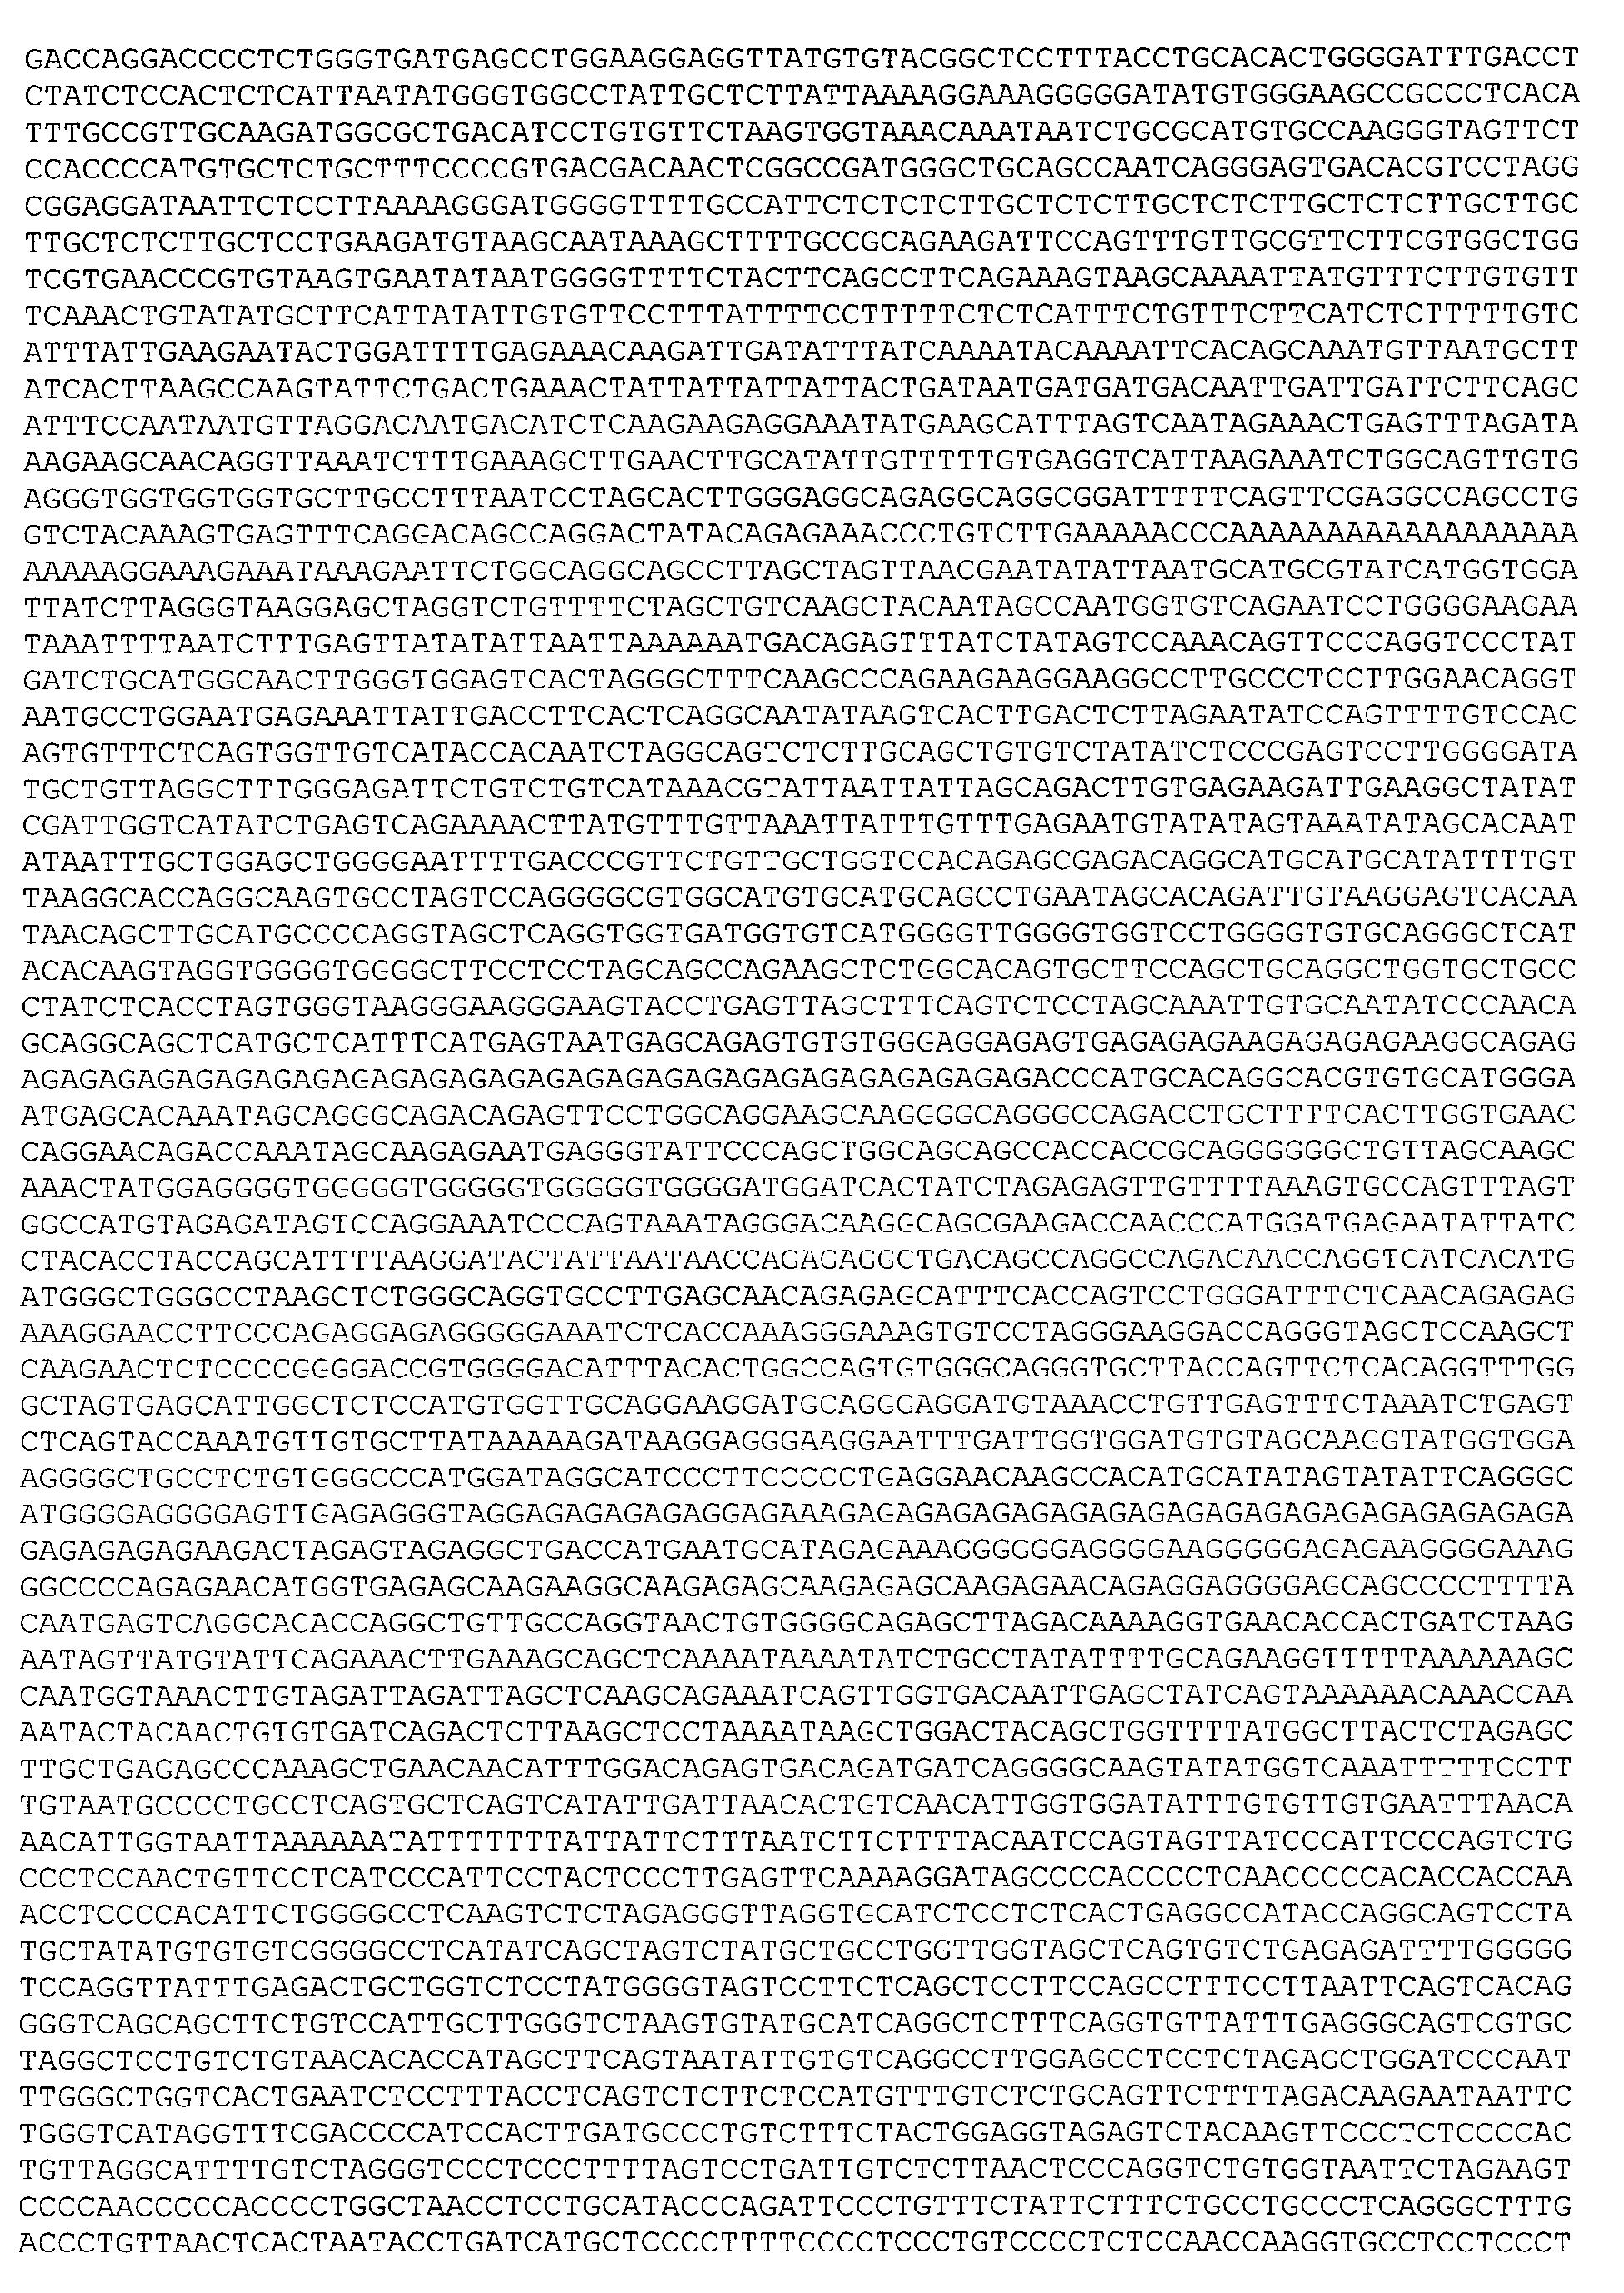 Figure imgb0330